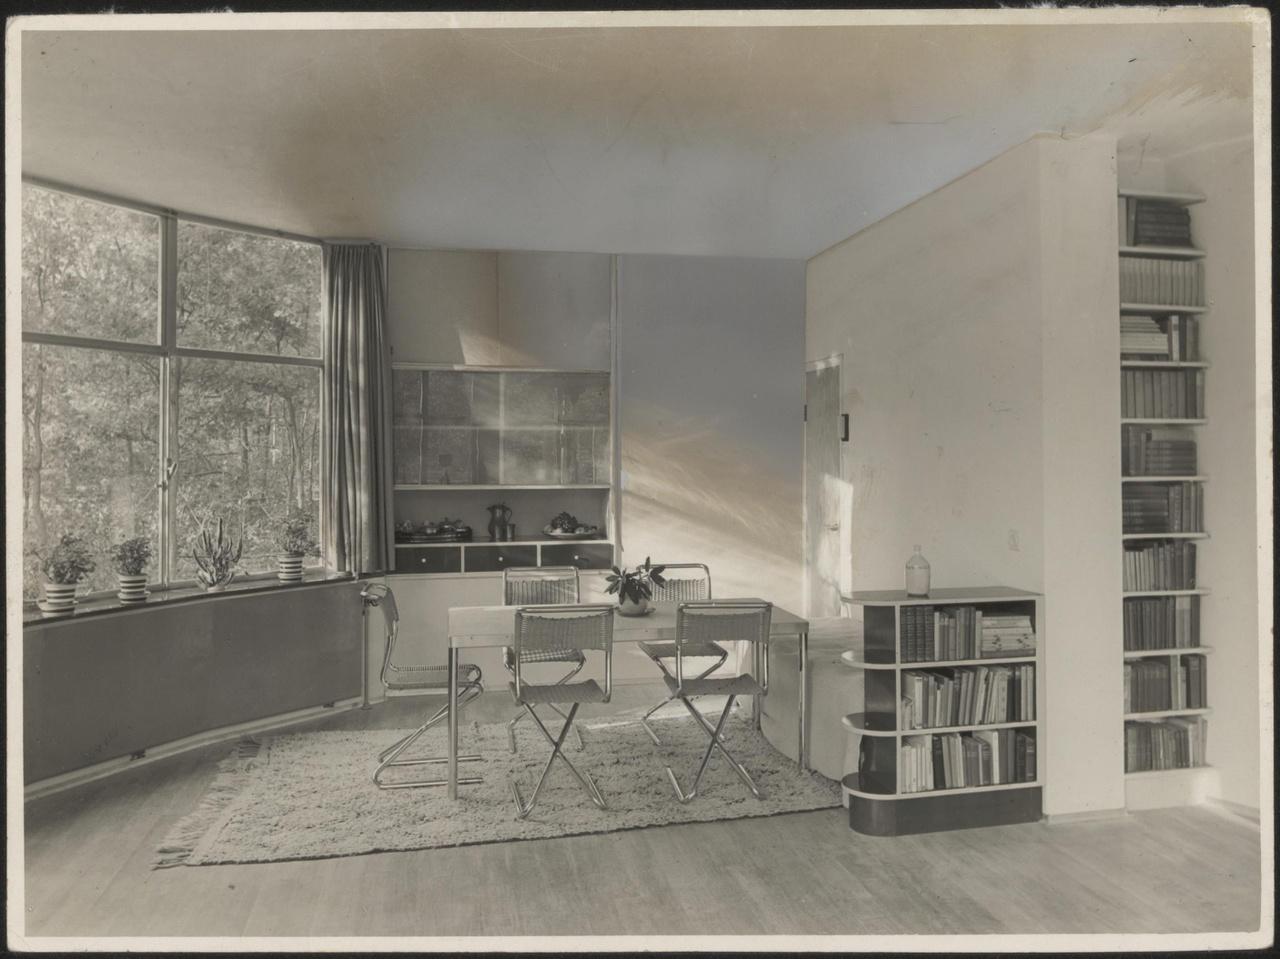 Afbeelding van woning Mees, eethoek, plafondlamp weggeretoucheerd